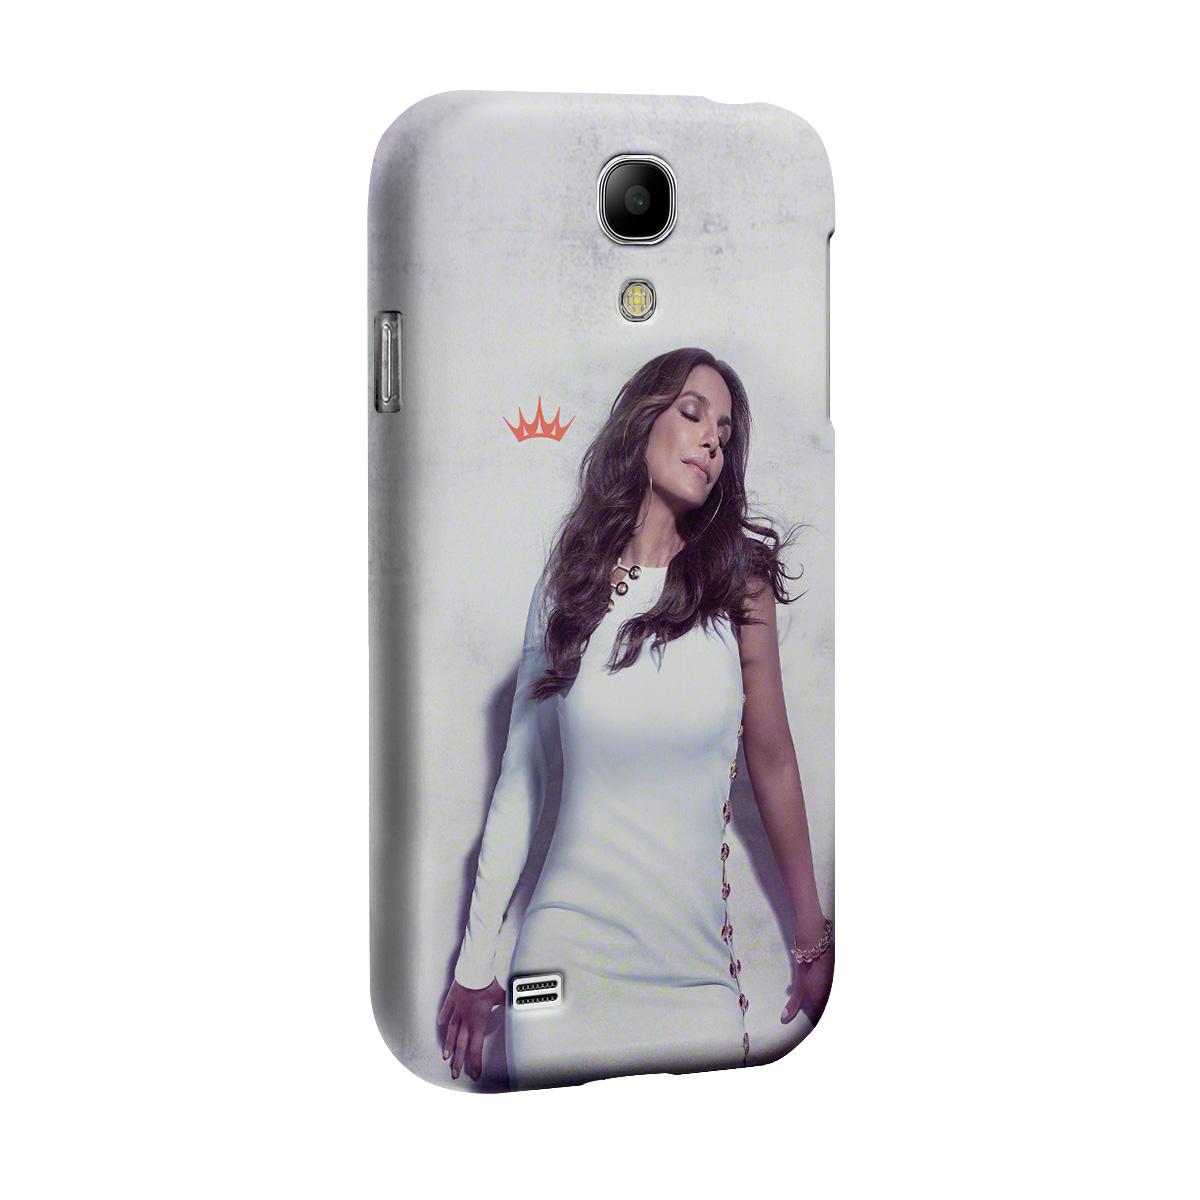 Capa para Samsung Galaxy S4 Ivete Sangalo Careless Whisper